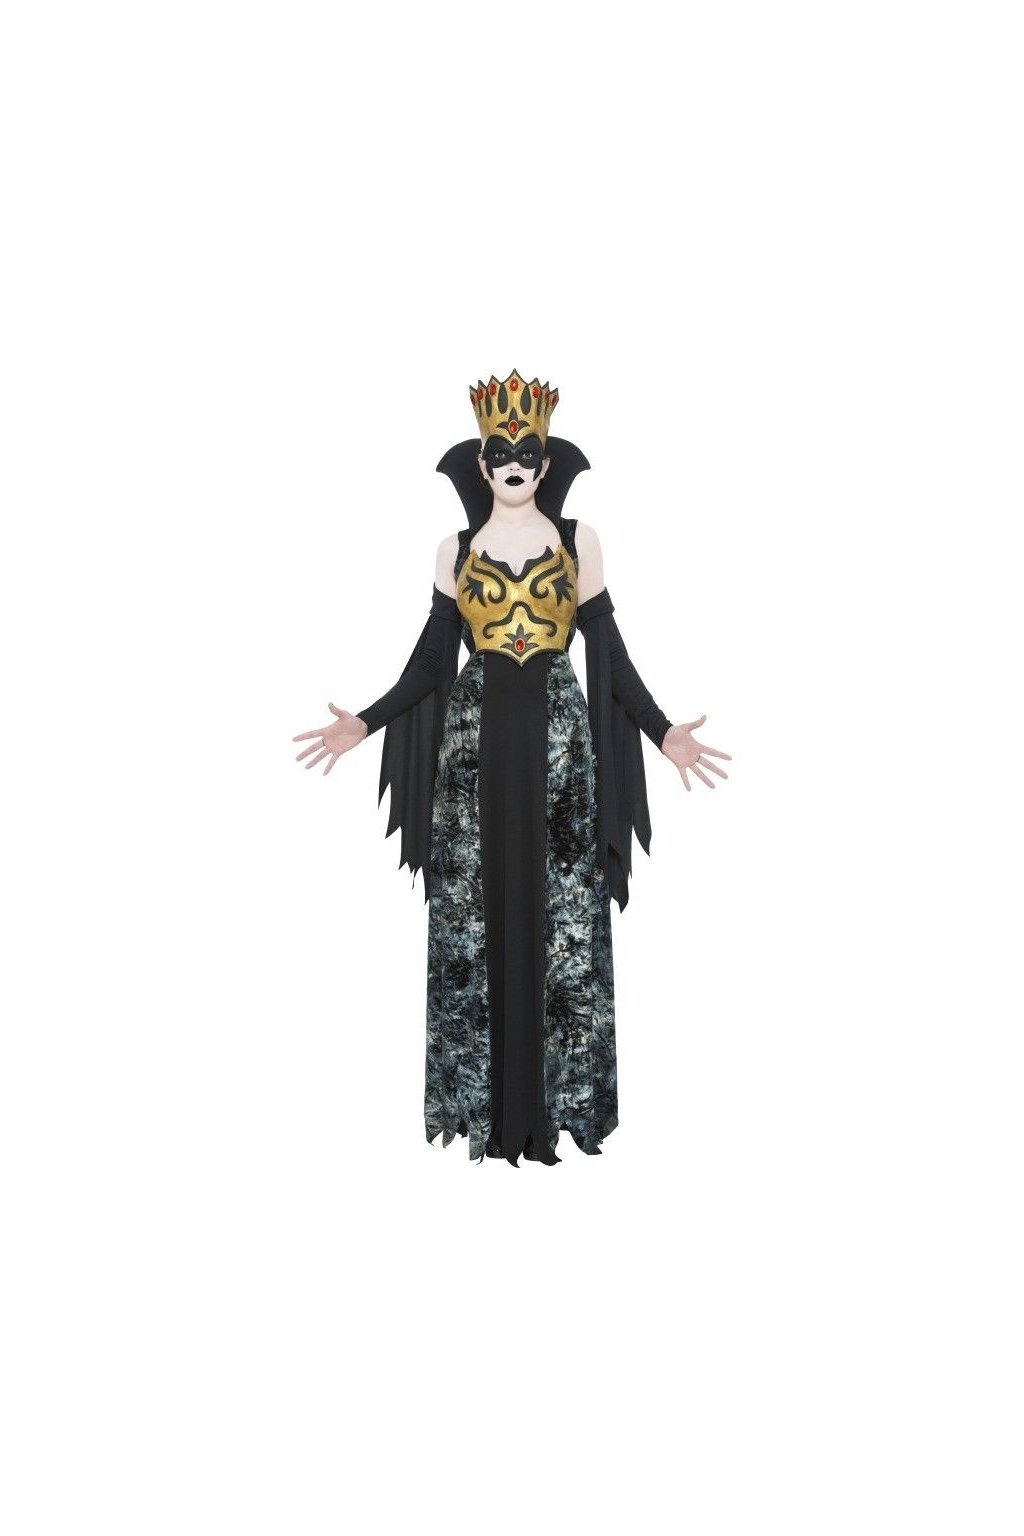 Kostým Temná královna čarodějnic